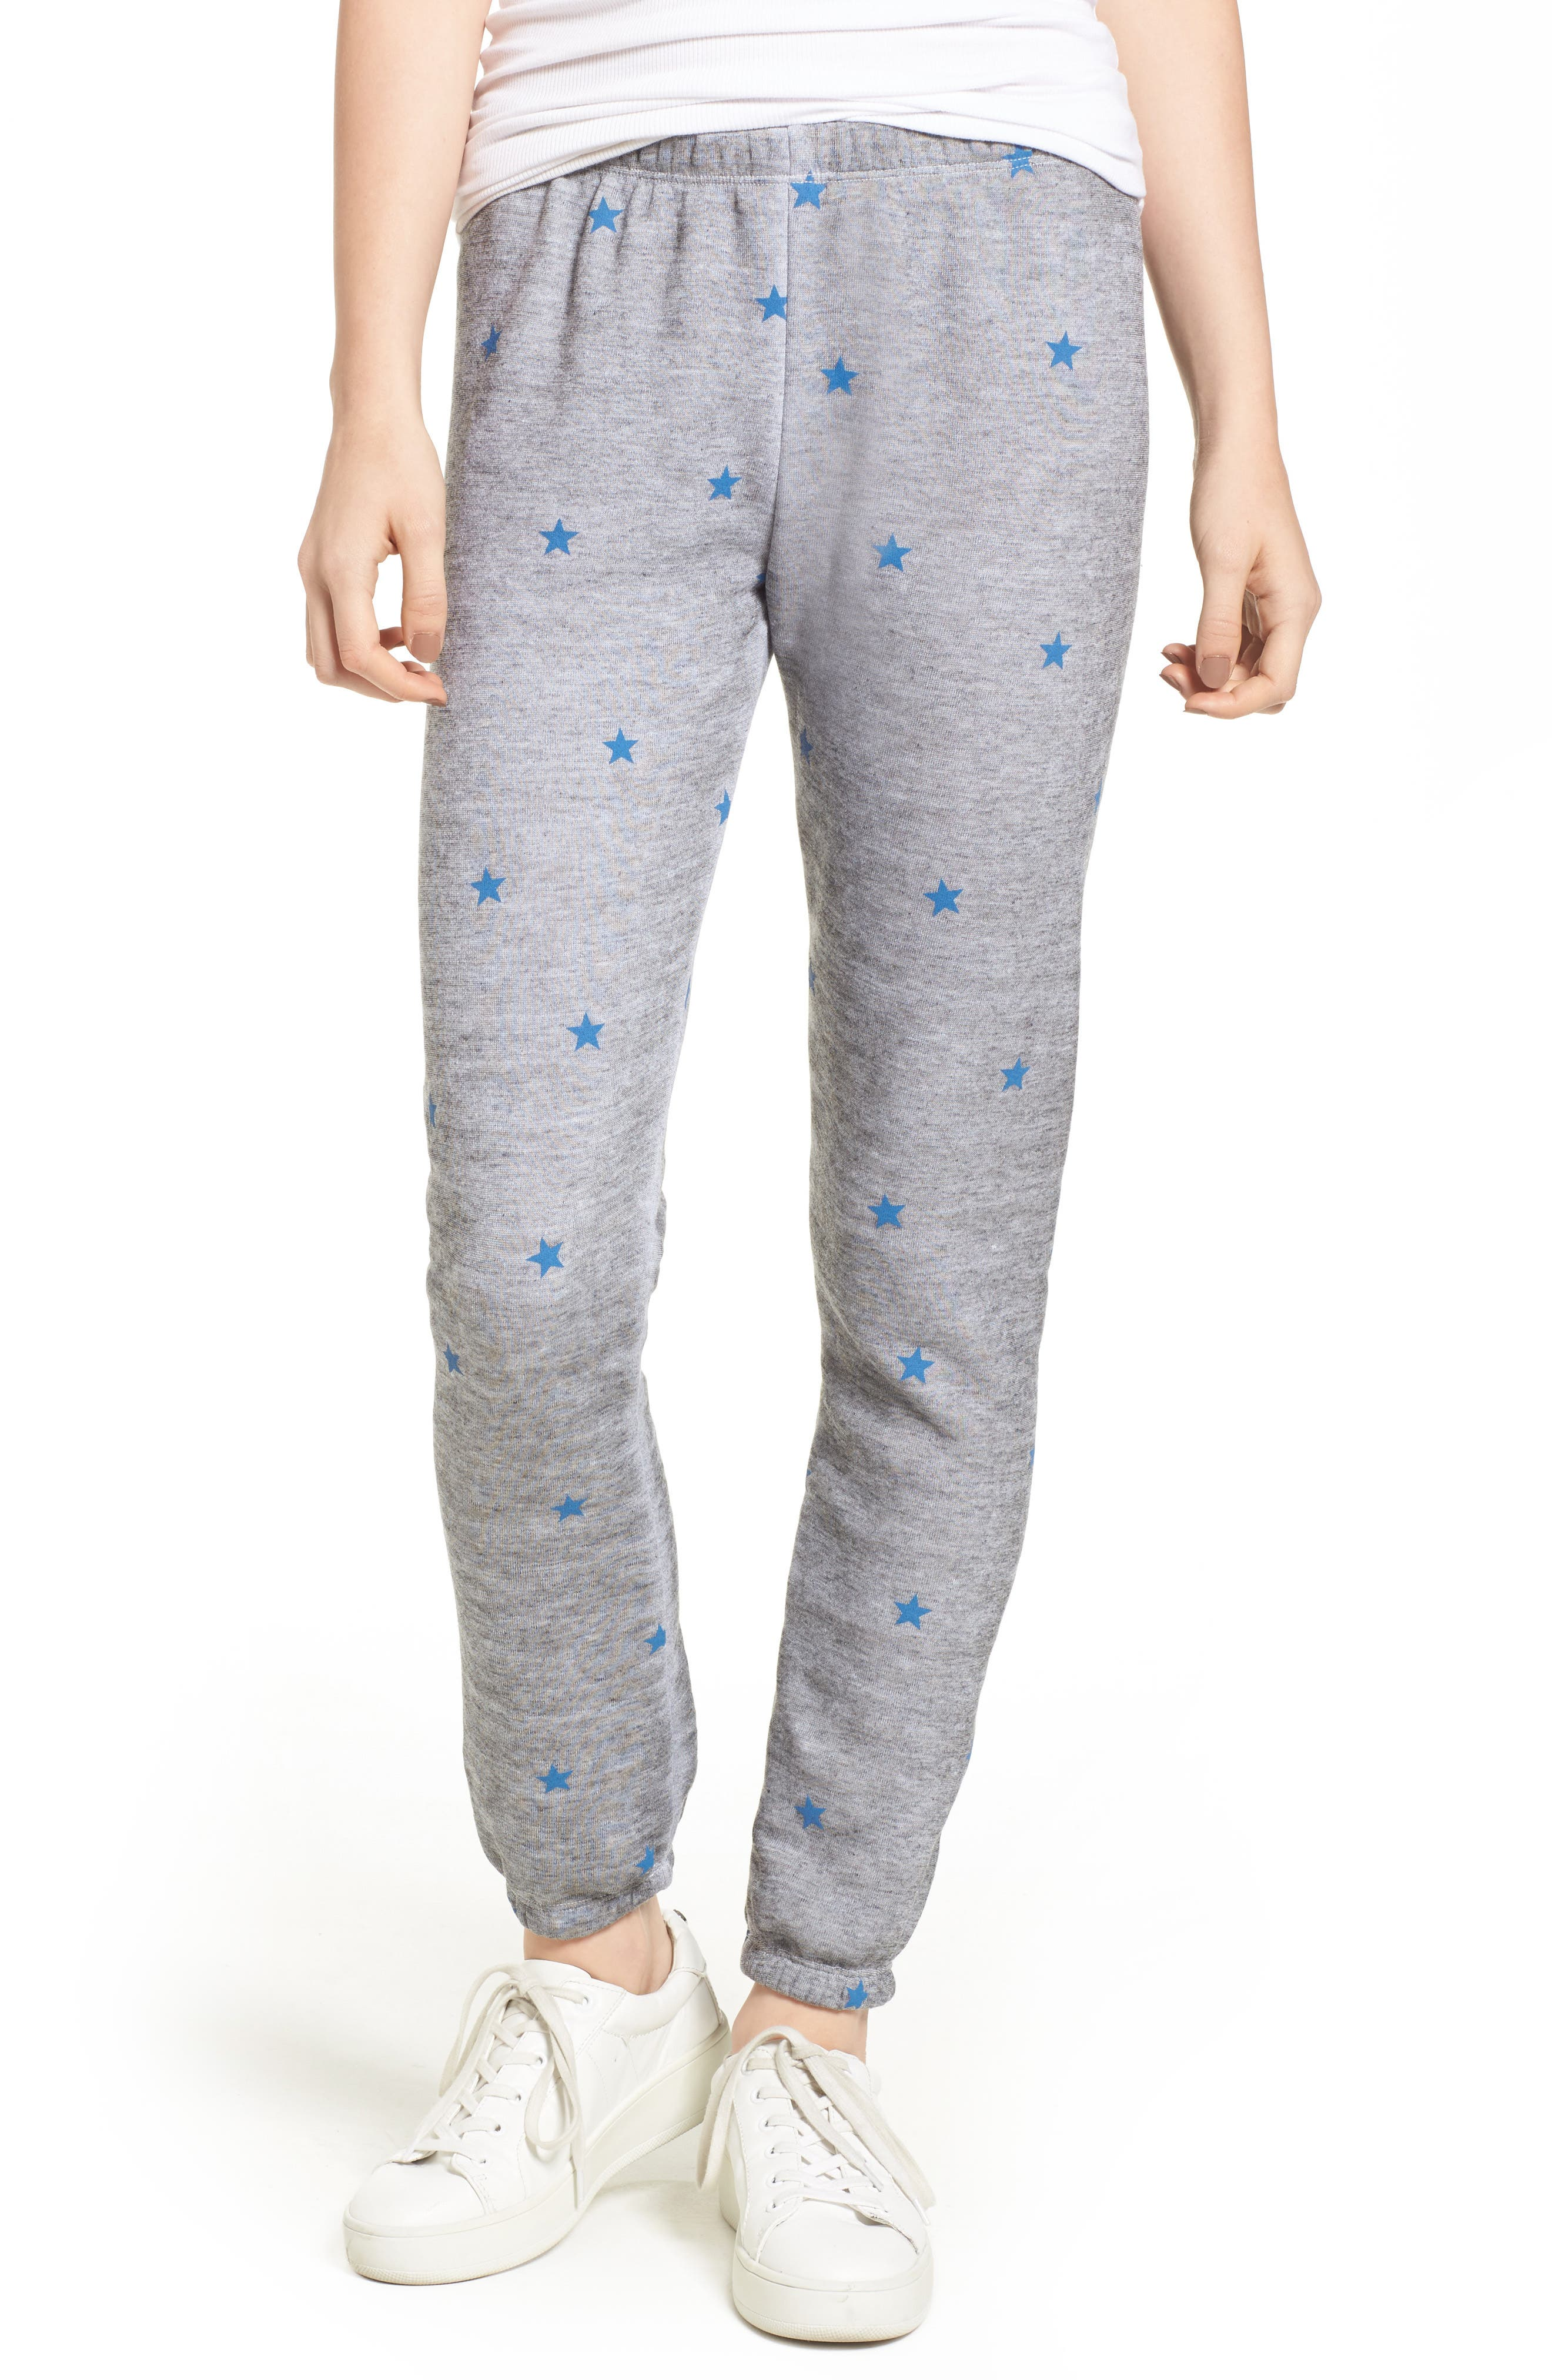 WILDFOX Football Star Knot Sweatpants, Main, color, 020